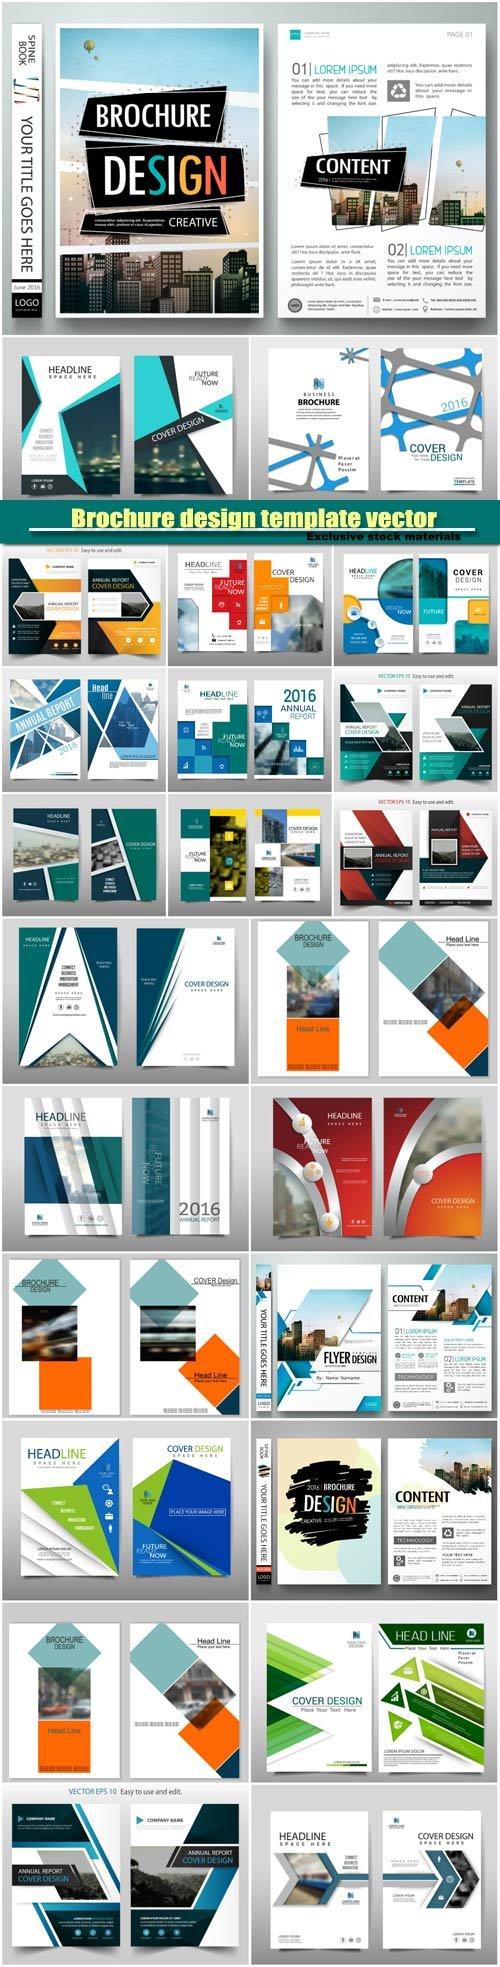 Brochure design template vector layout, cover book portfolio